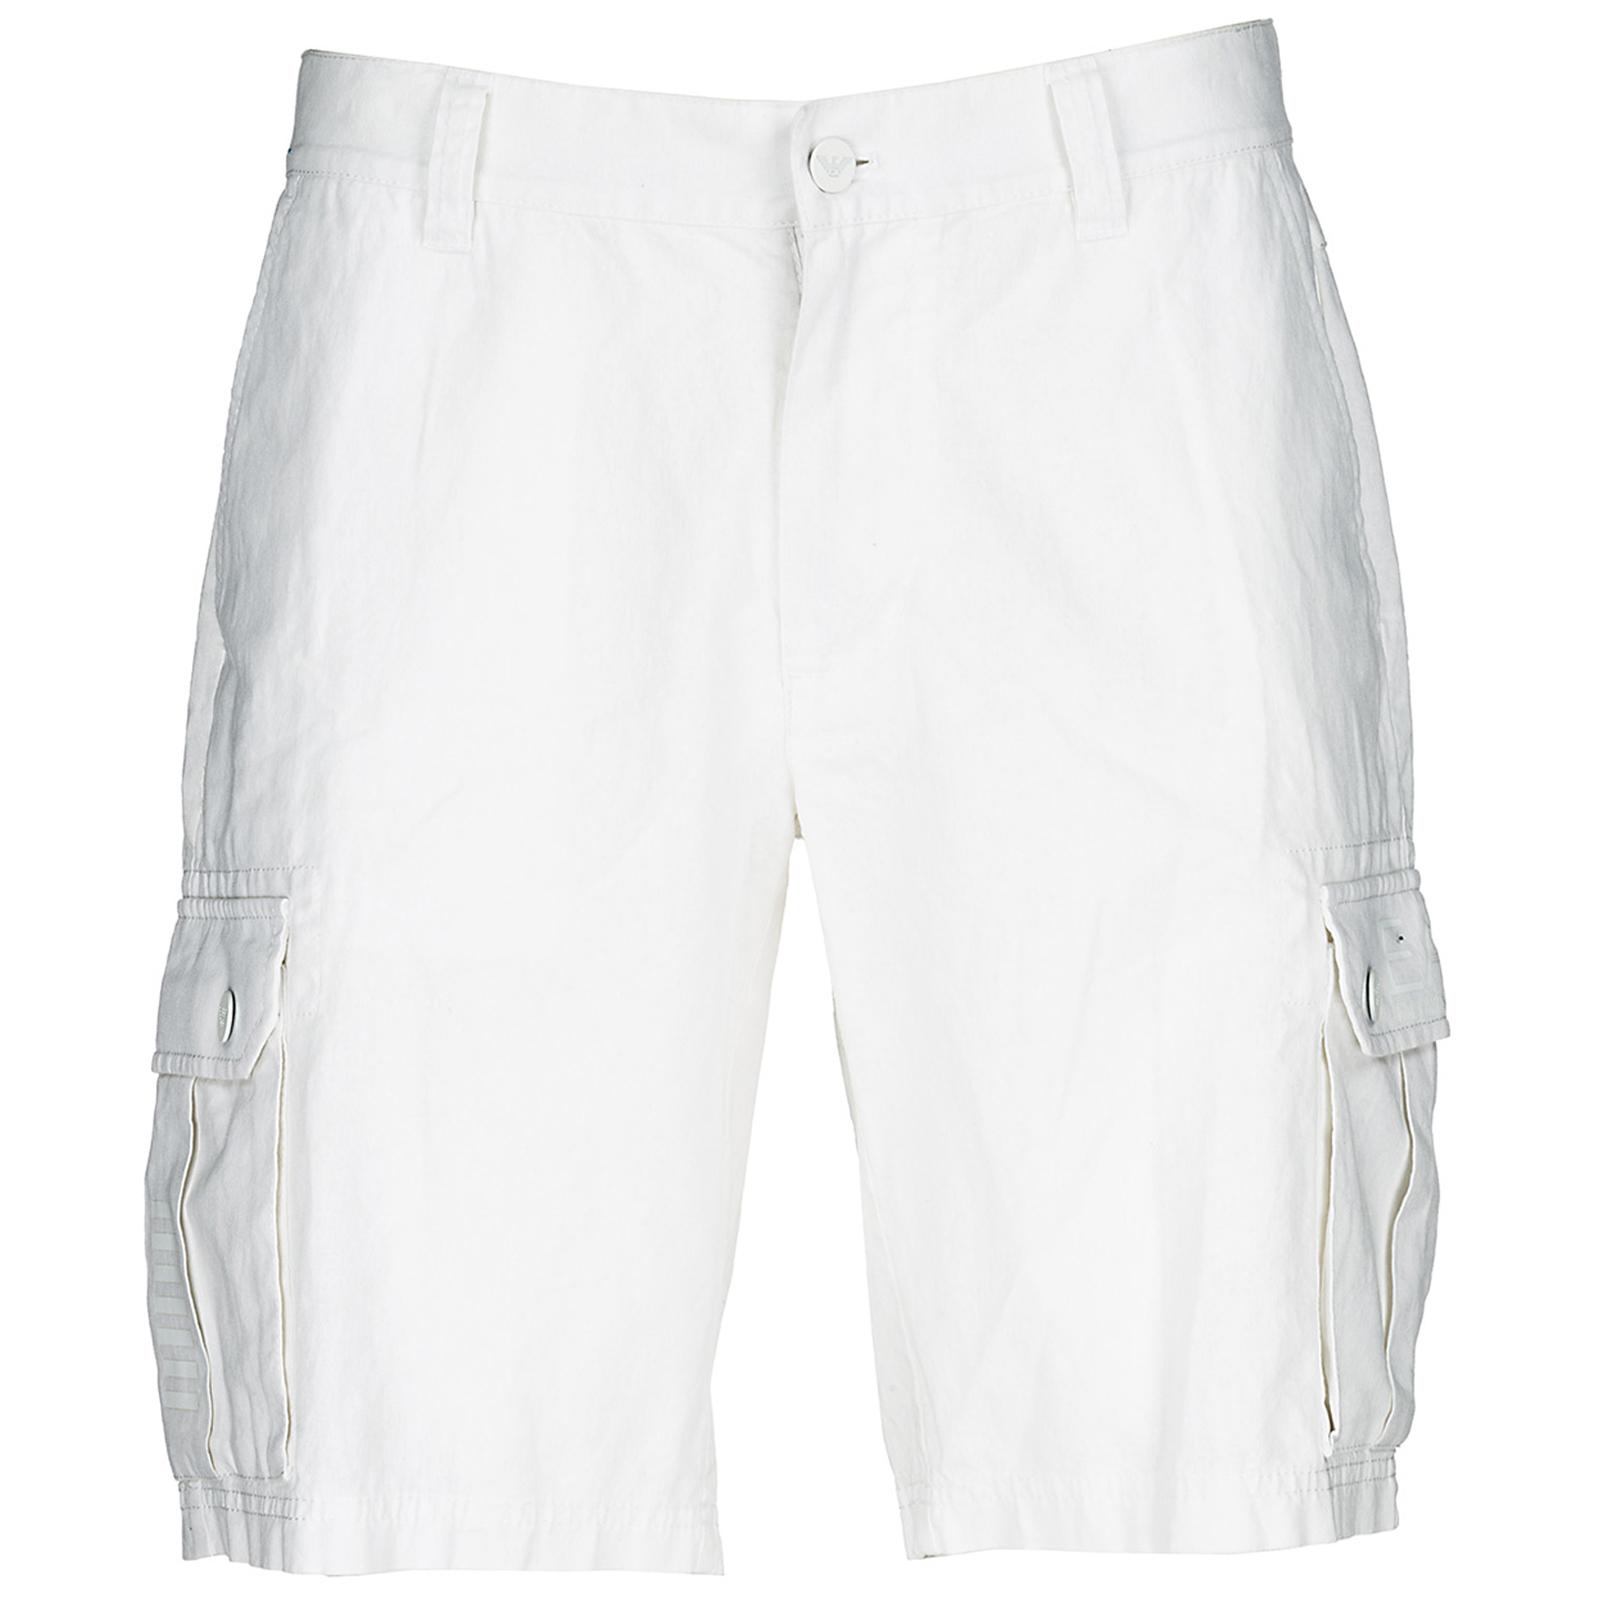 bianco Bermuda Armani 78e87c3993bd64 3ZPS15PN92Z1100 bfb40907222b6c jeans EA7 Homme Pantalons Emporio twill ; Short qw4HHX1